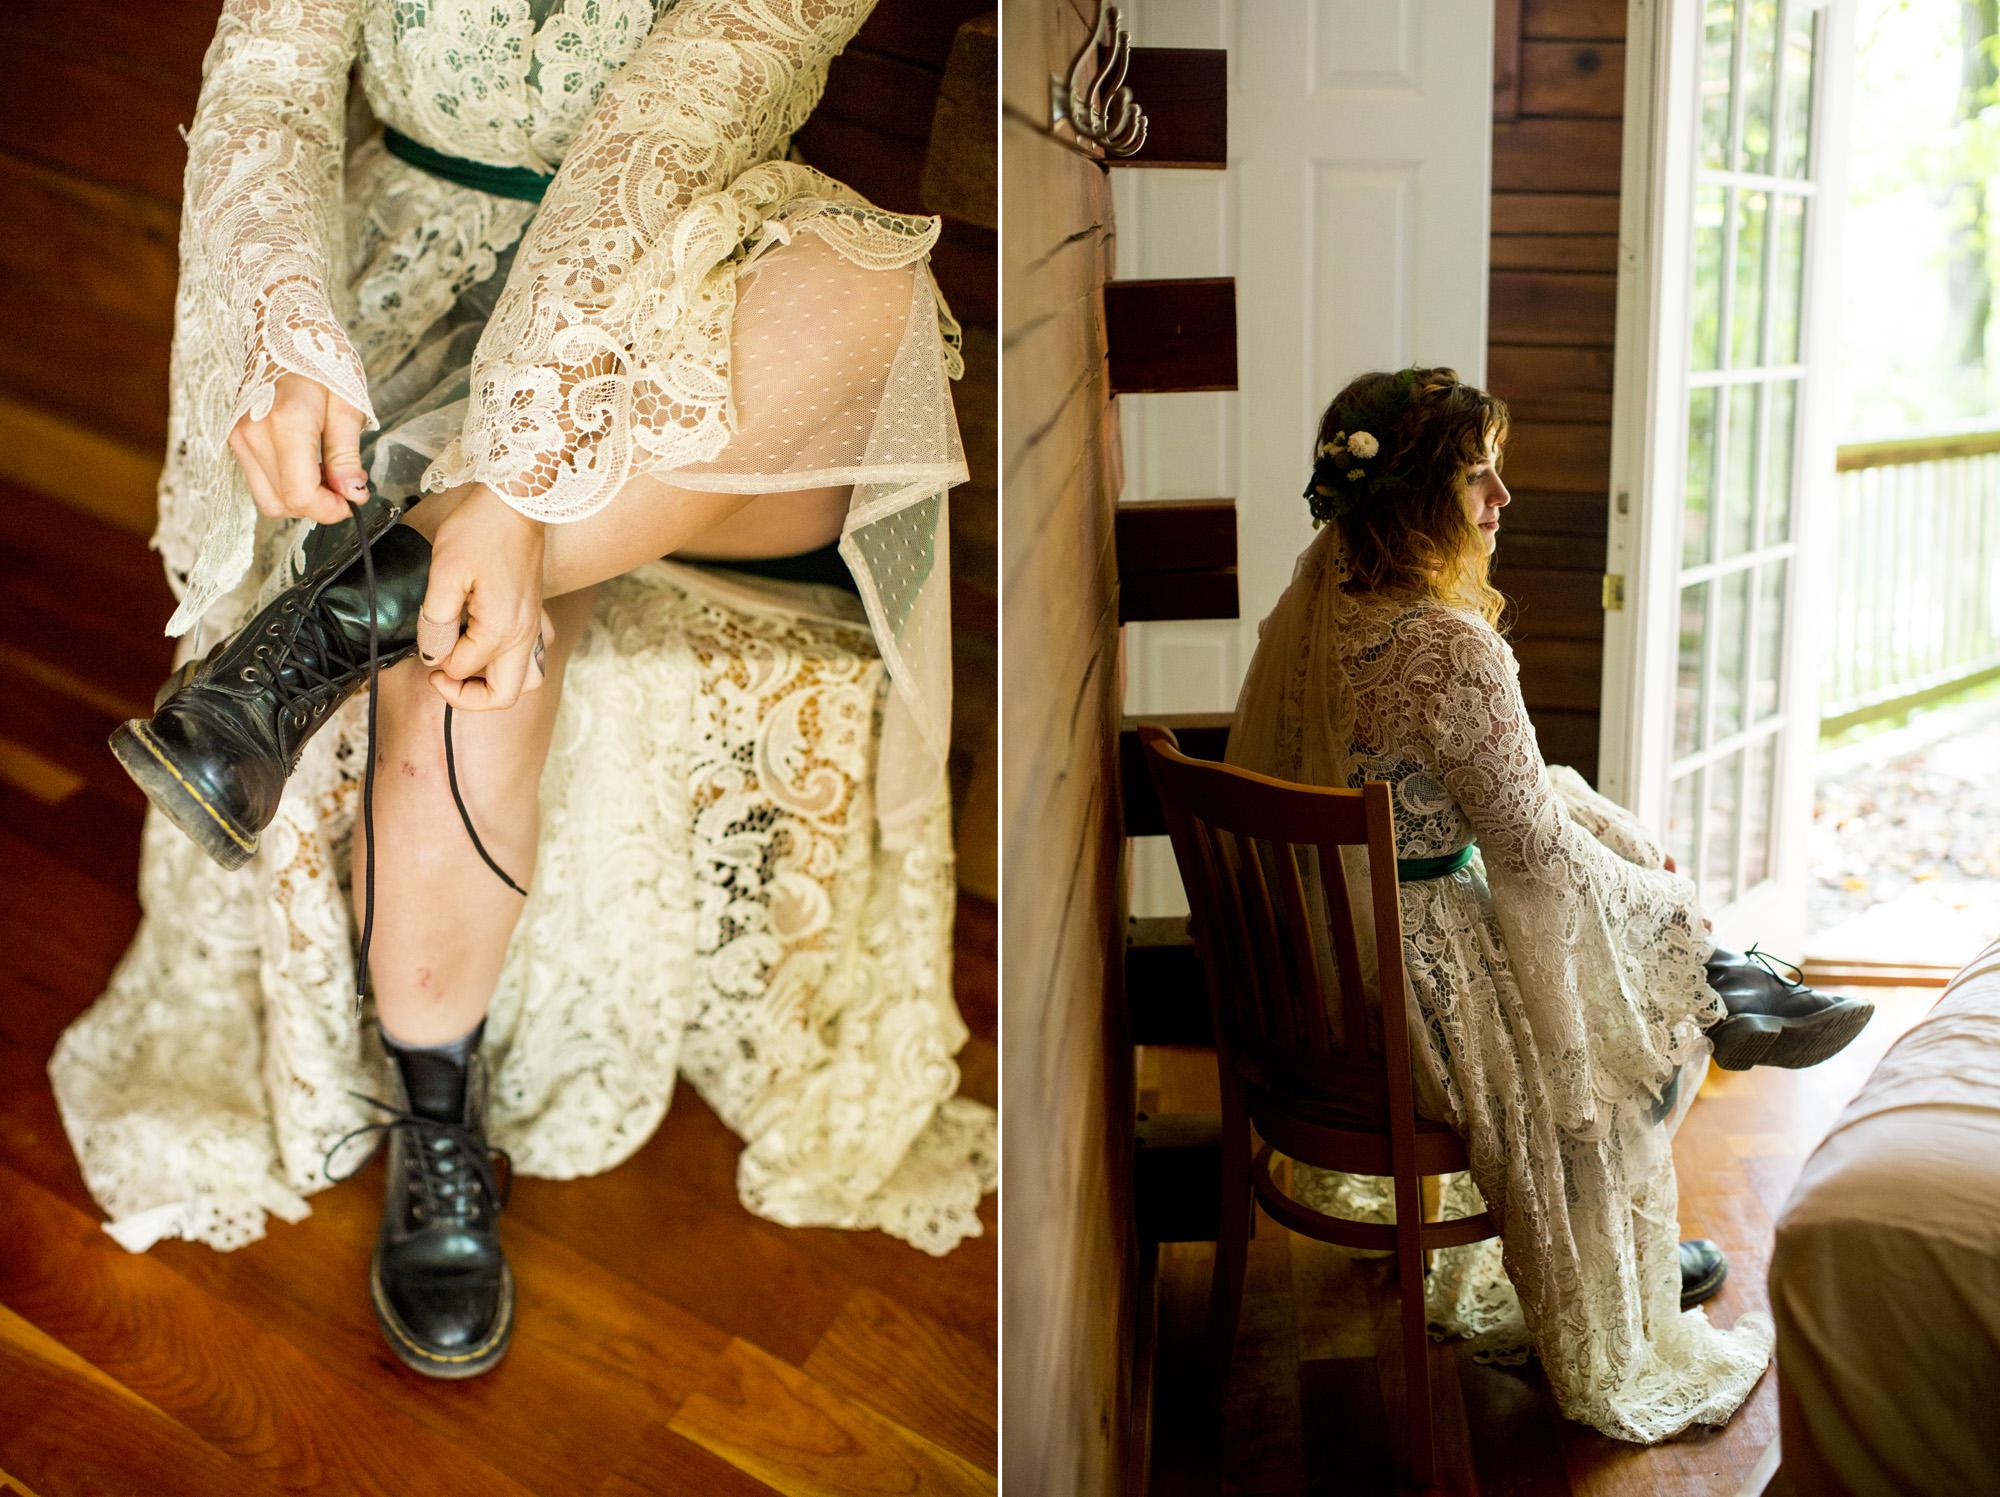 Seriously_Sabrina_Photography_Red_River_Gorge_Kentucky_Wedding_ShawnDana60.jpg